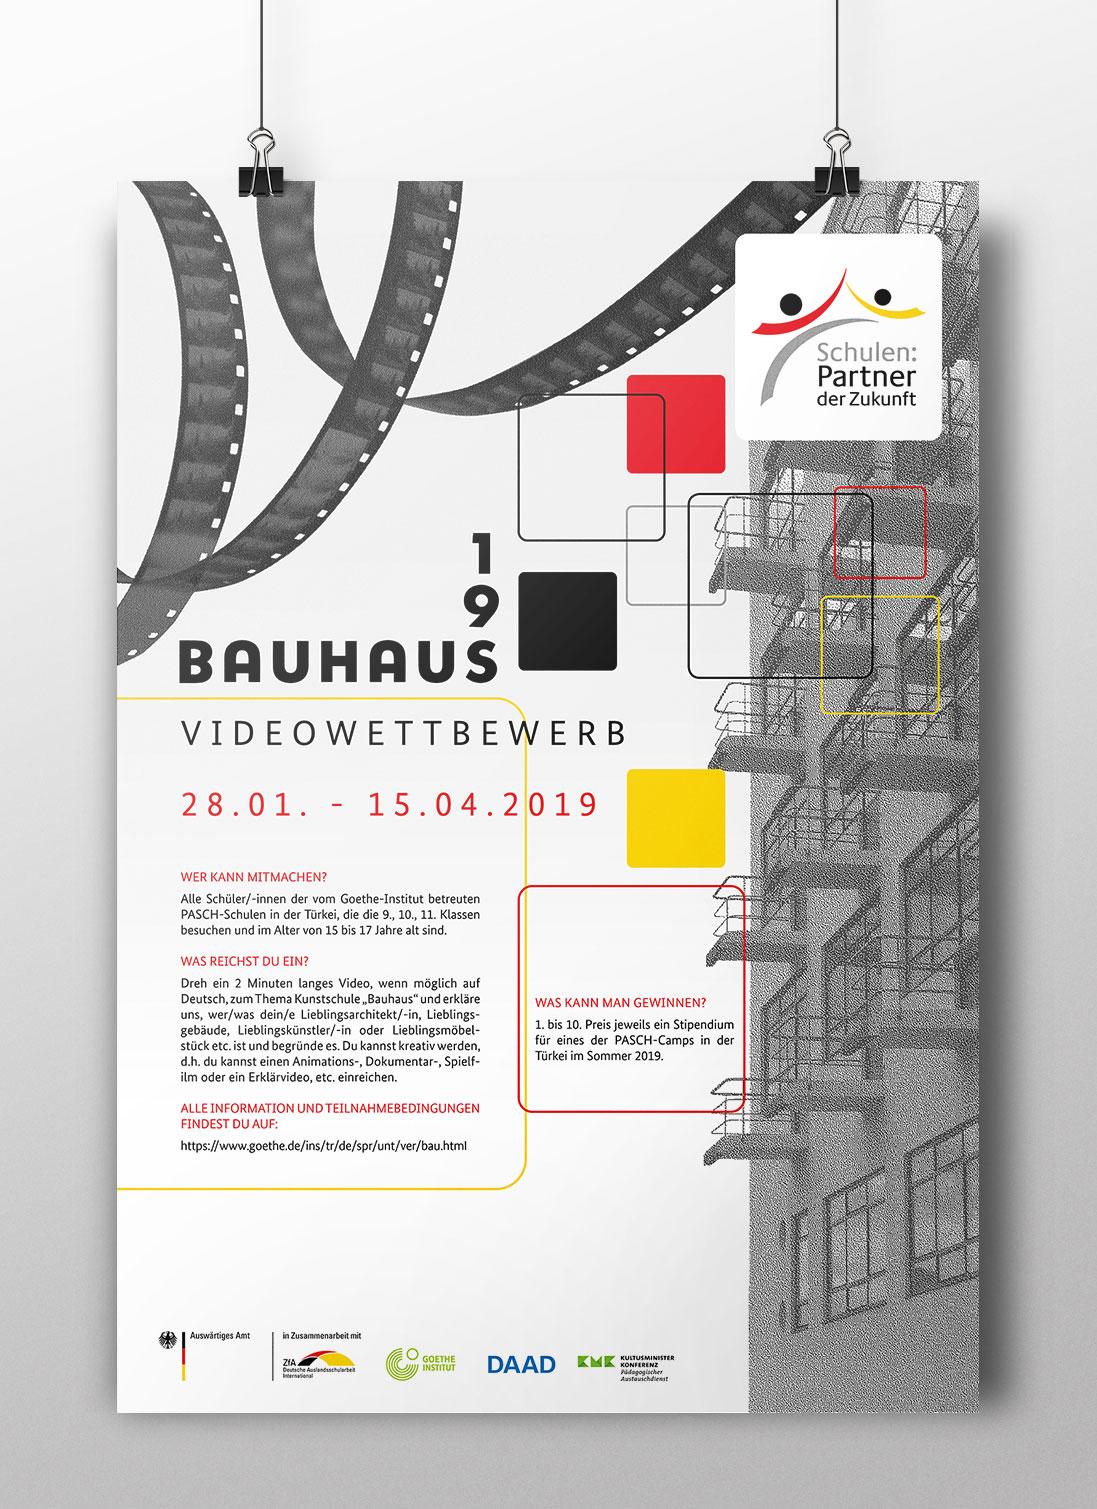 Poster-Mockup_Bauhaus_Goethe_Institut_70x100_1400x200px